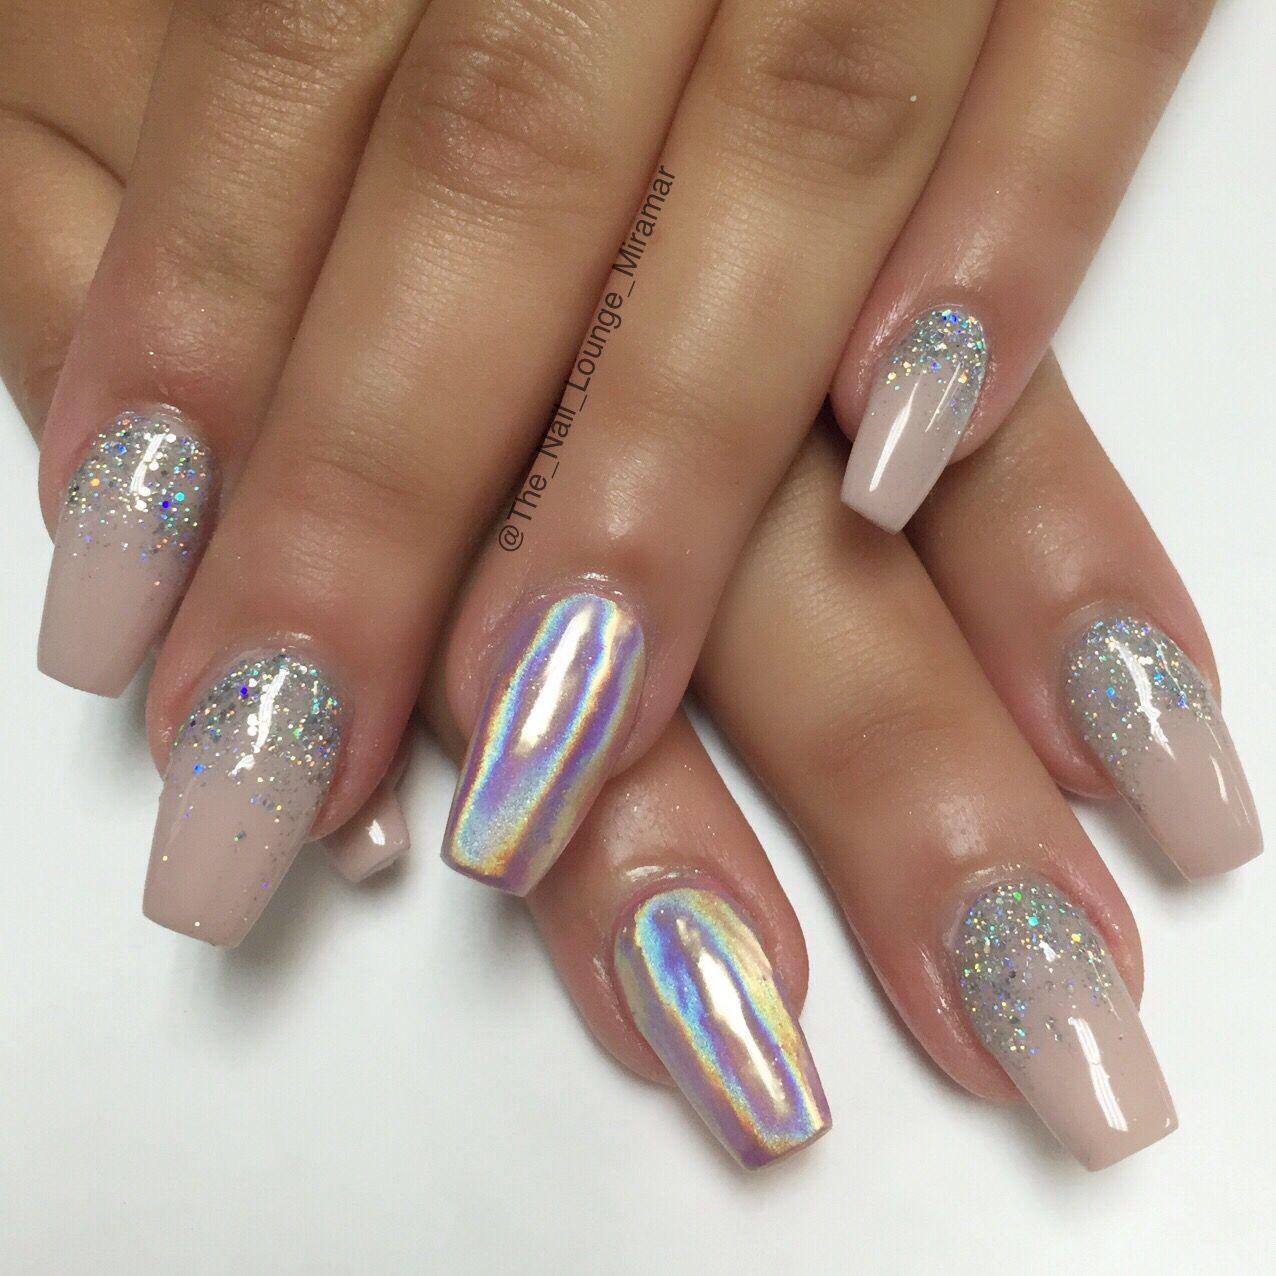 Chrome Acrylic Nail Designs